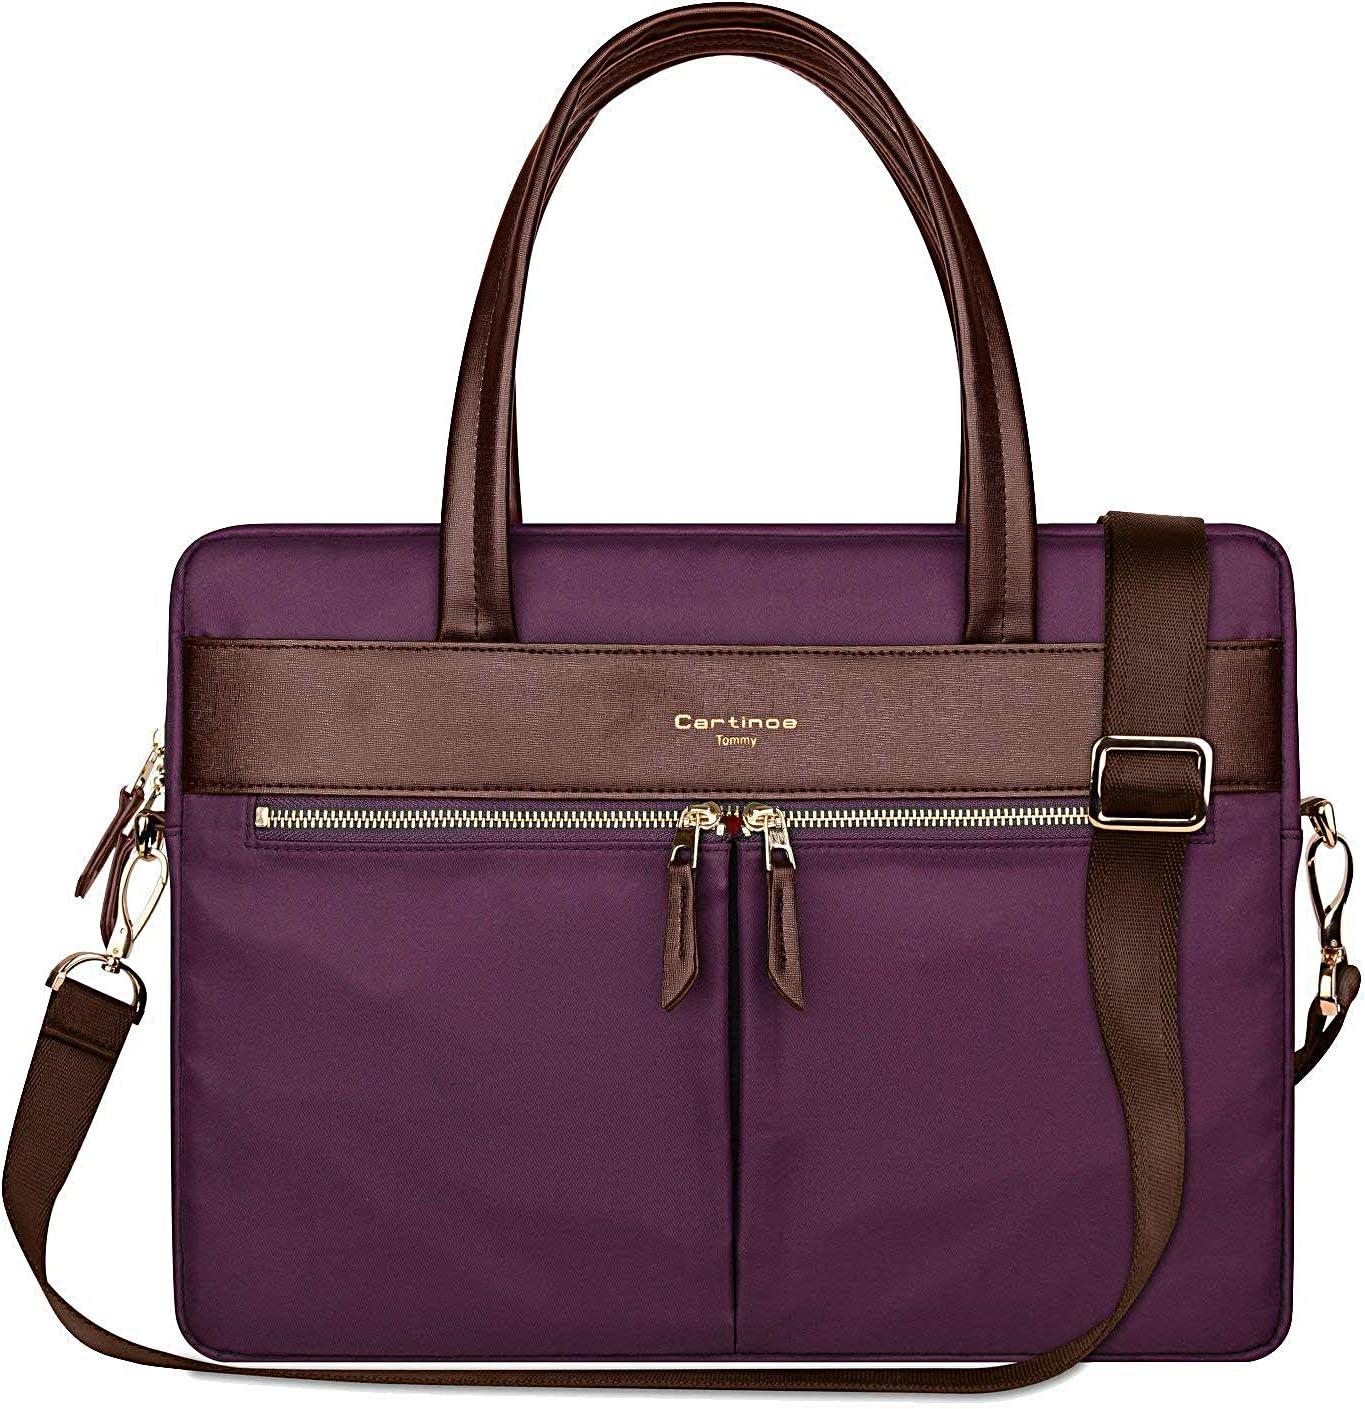 Cartinoe Laptop Tote Bag, Women Waterproof Laptop Bag Briefcase RFID Blocking Ultrathin Nylon Business Ladies Work Handbag Shoulder Messenger Carrying Bag for 14 15 inch MacBook Ultrabook, Purple